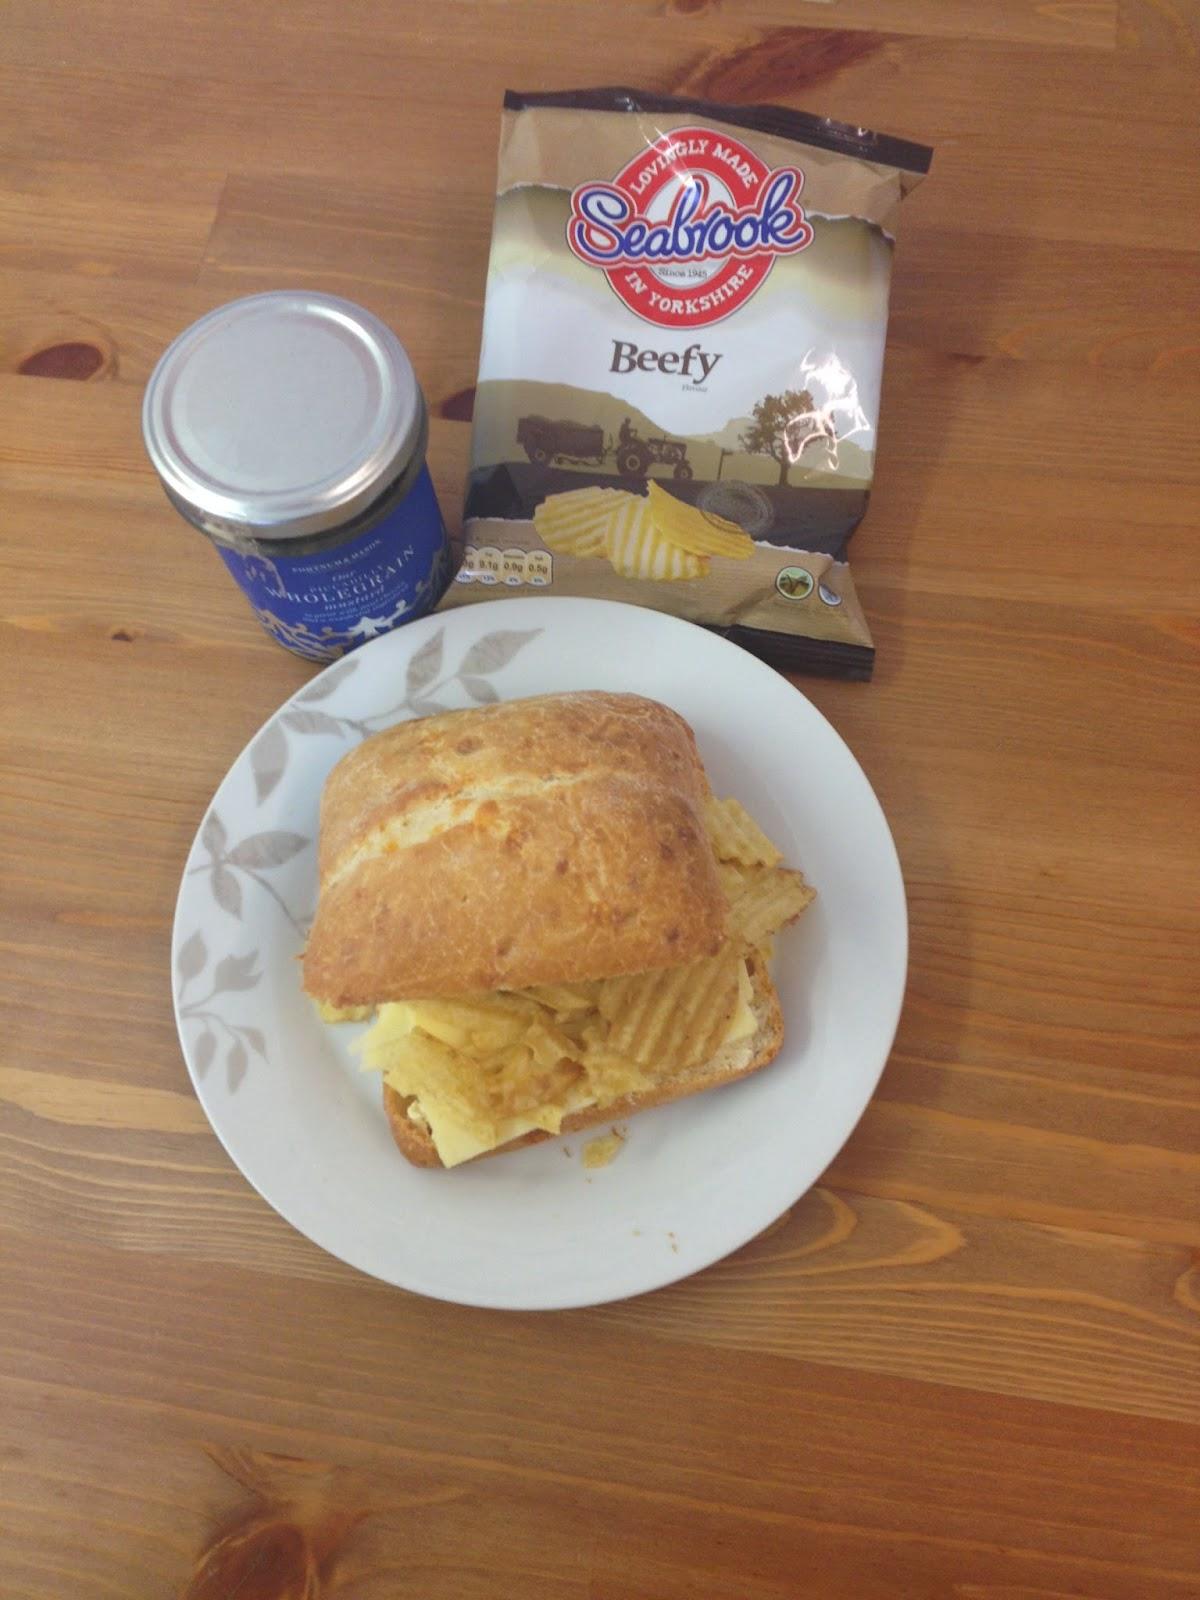 Celebrating Crisp Sarnie Week With Seabrook Crisps #crispsarnieweek